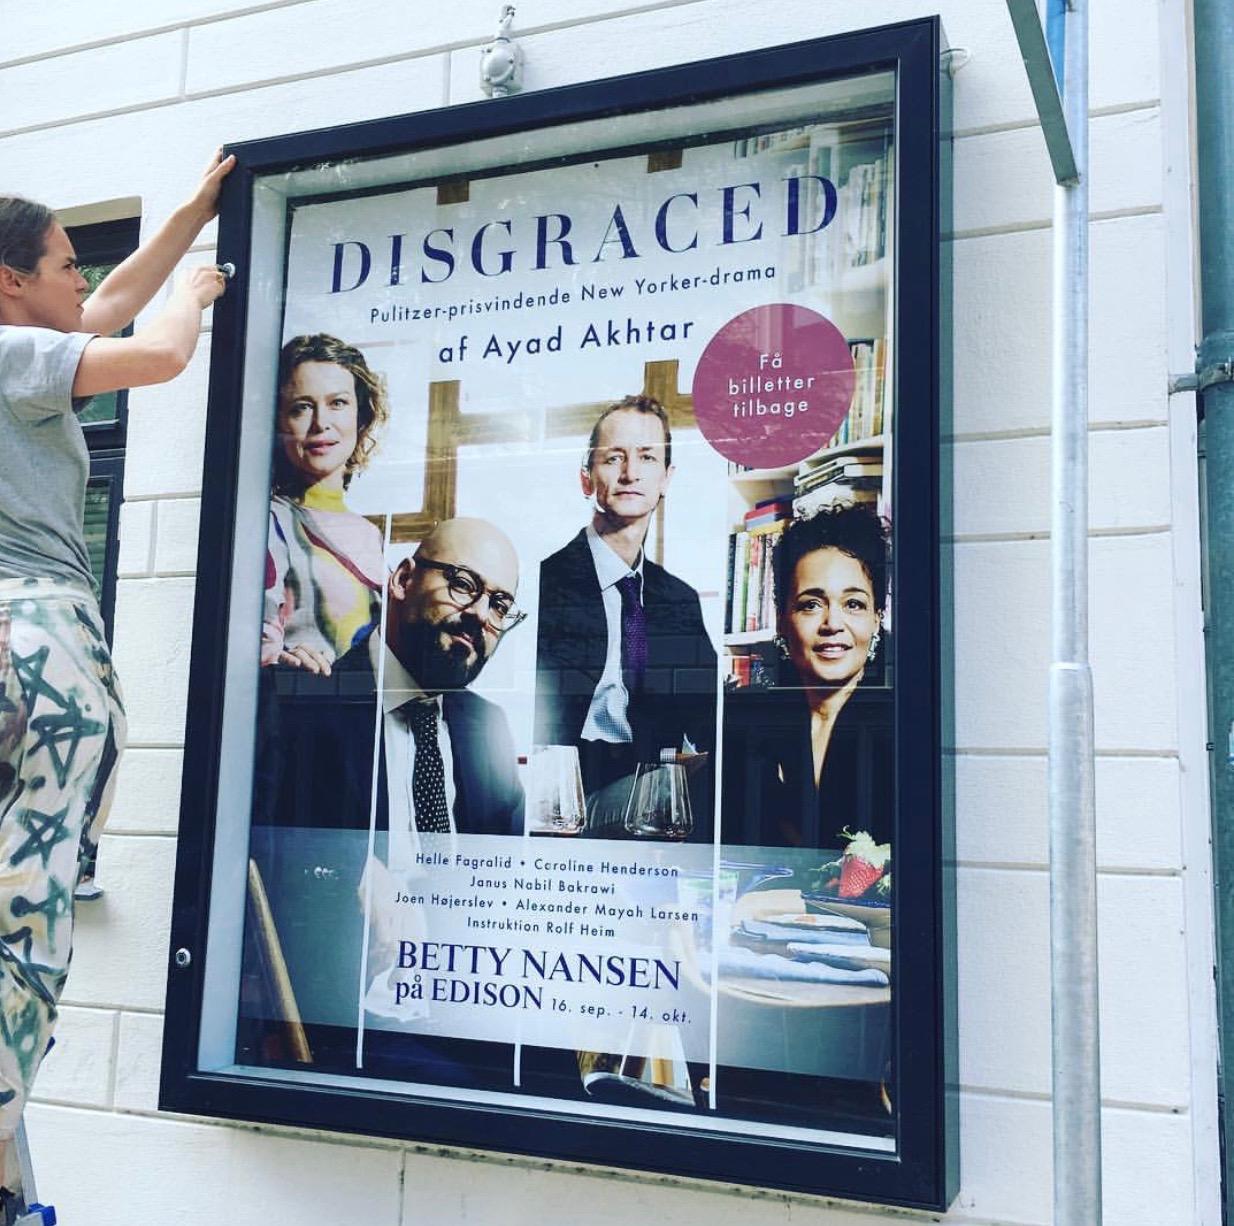 Montre plakat til Disgraced 2017